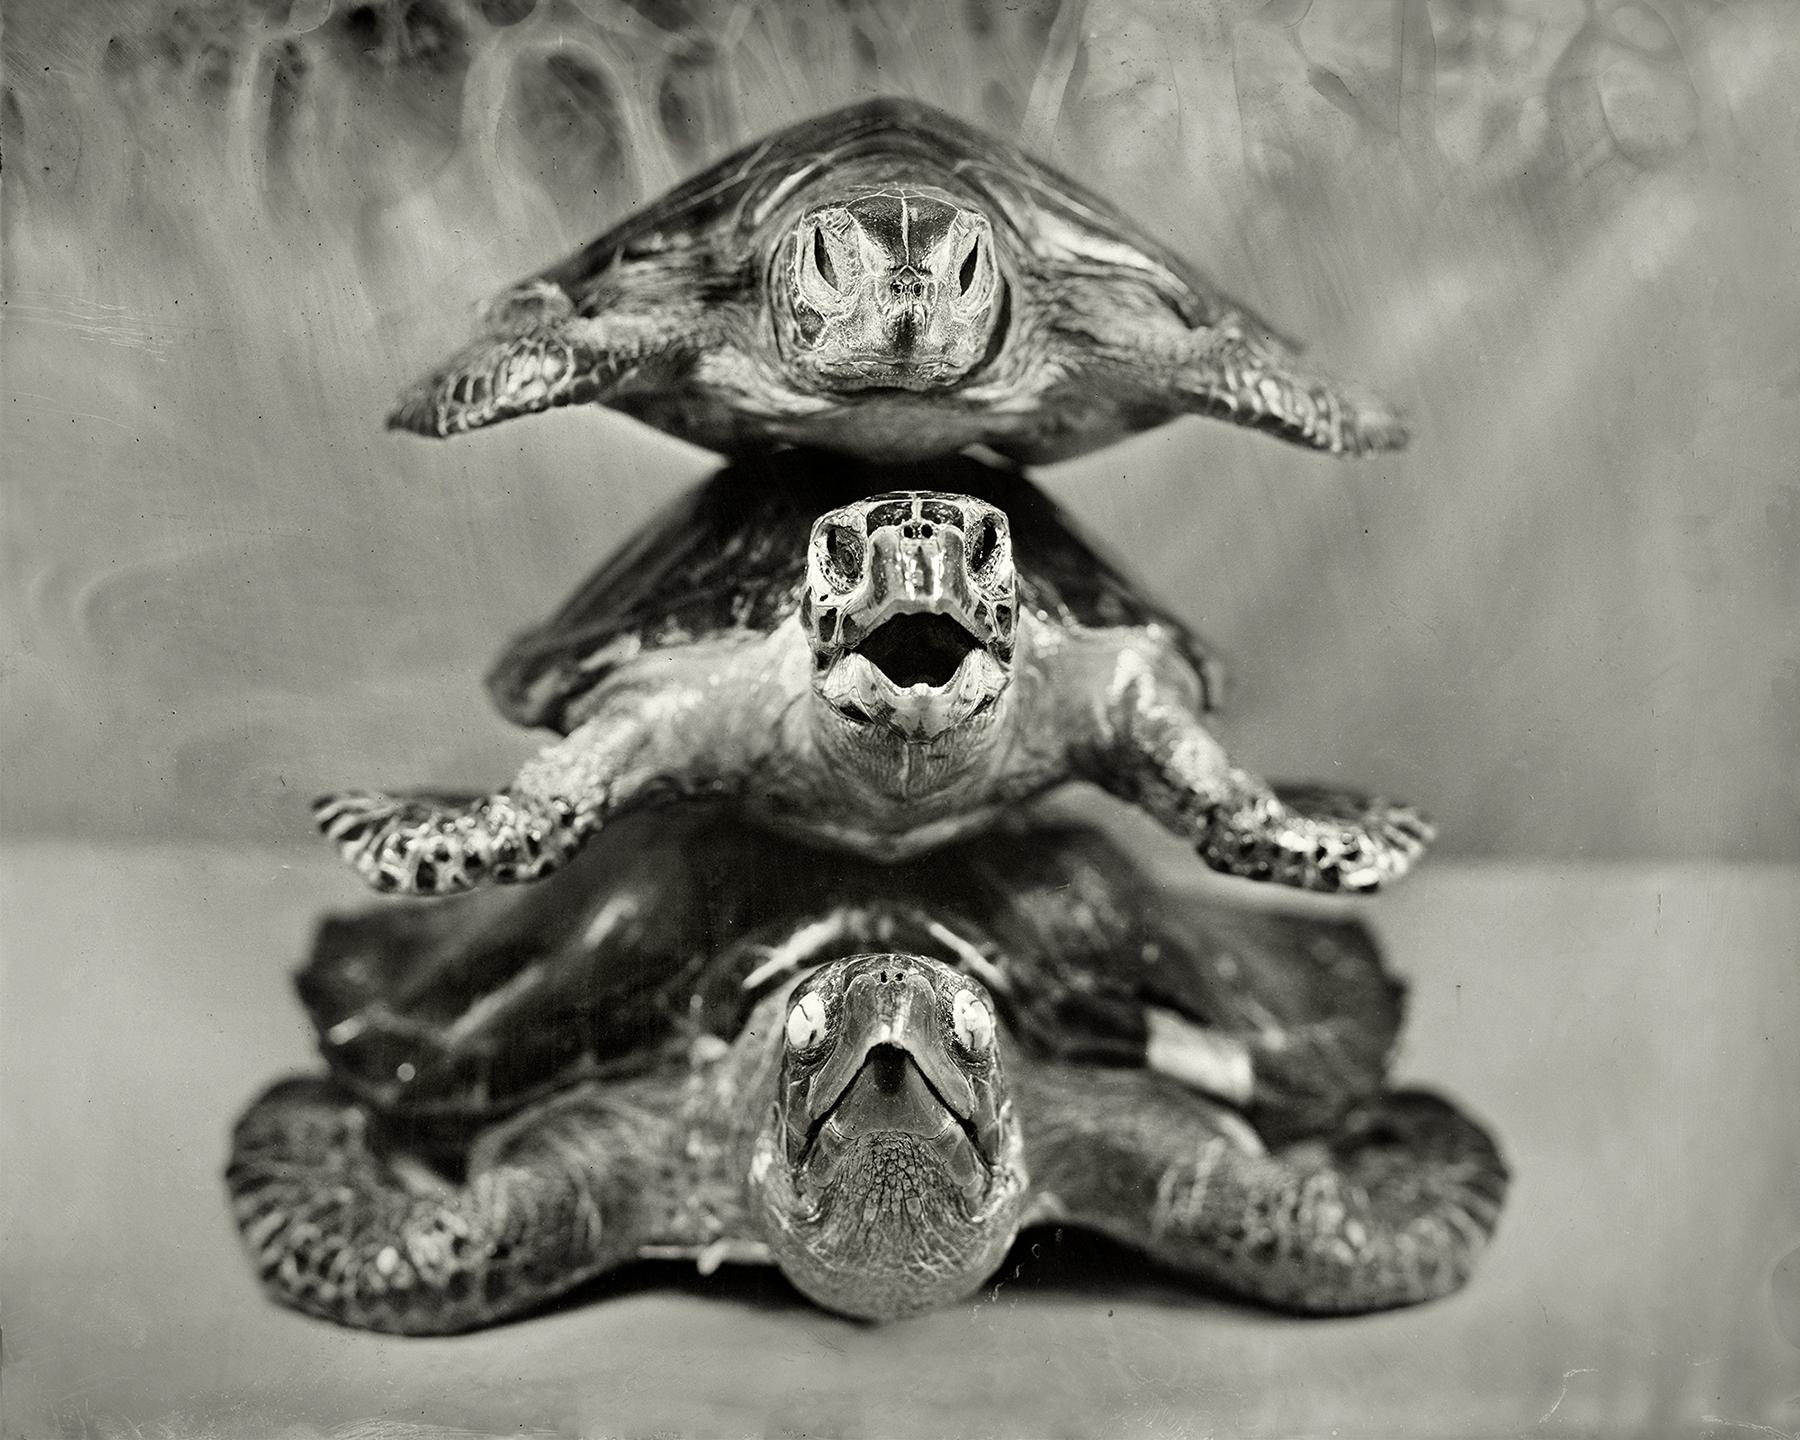 Christine_Fitzgerald_TRAFFICKED_Stacked Turtles_02.jpg